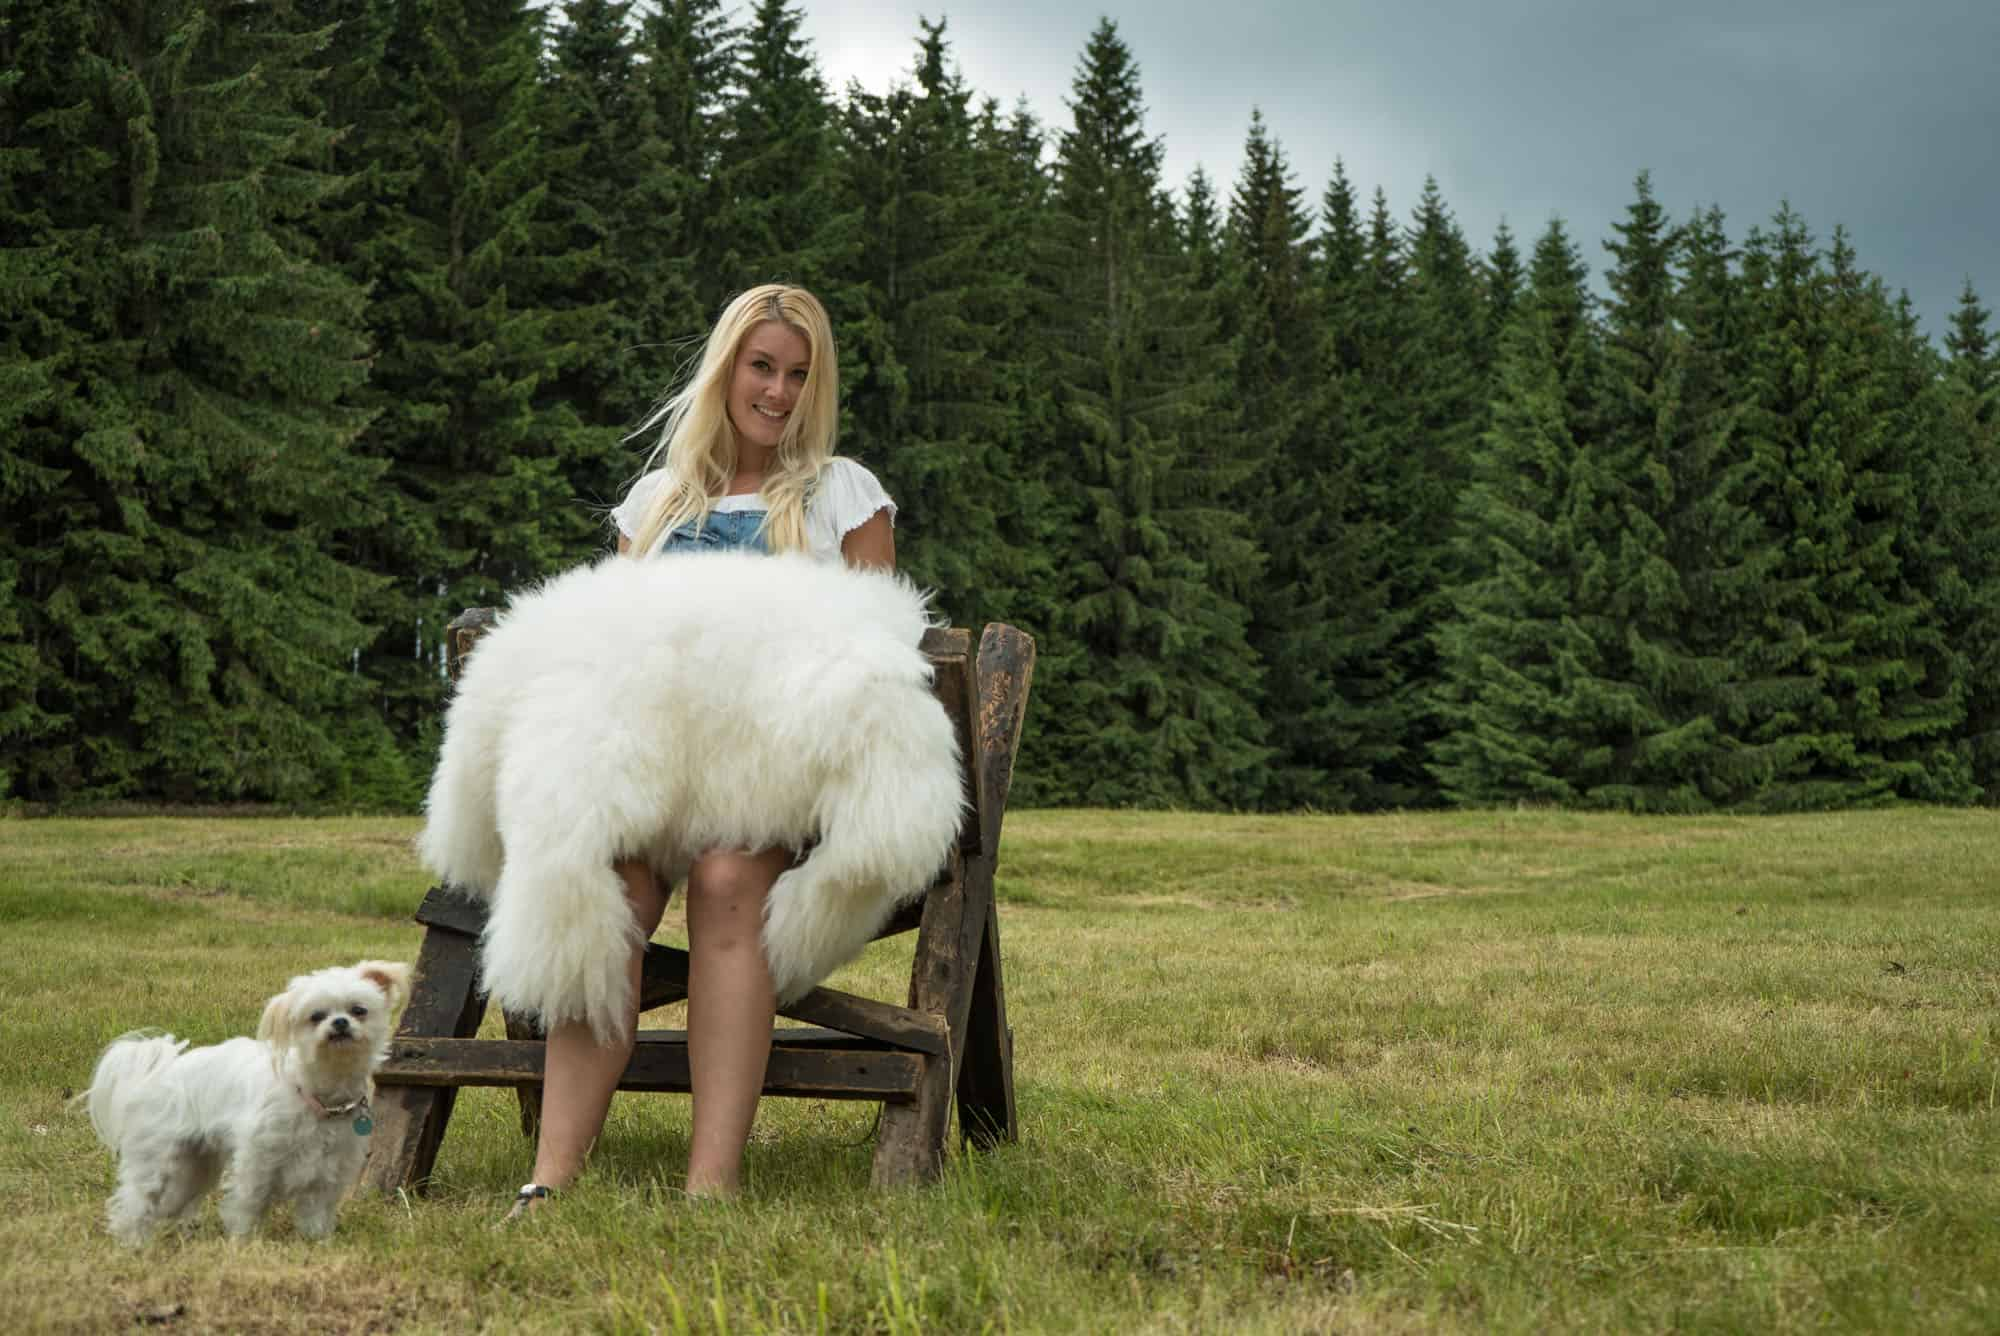 Sheepy.cc